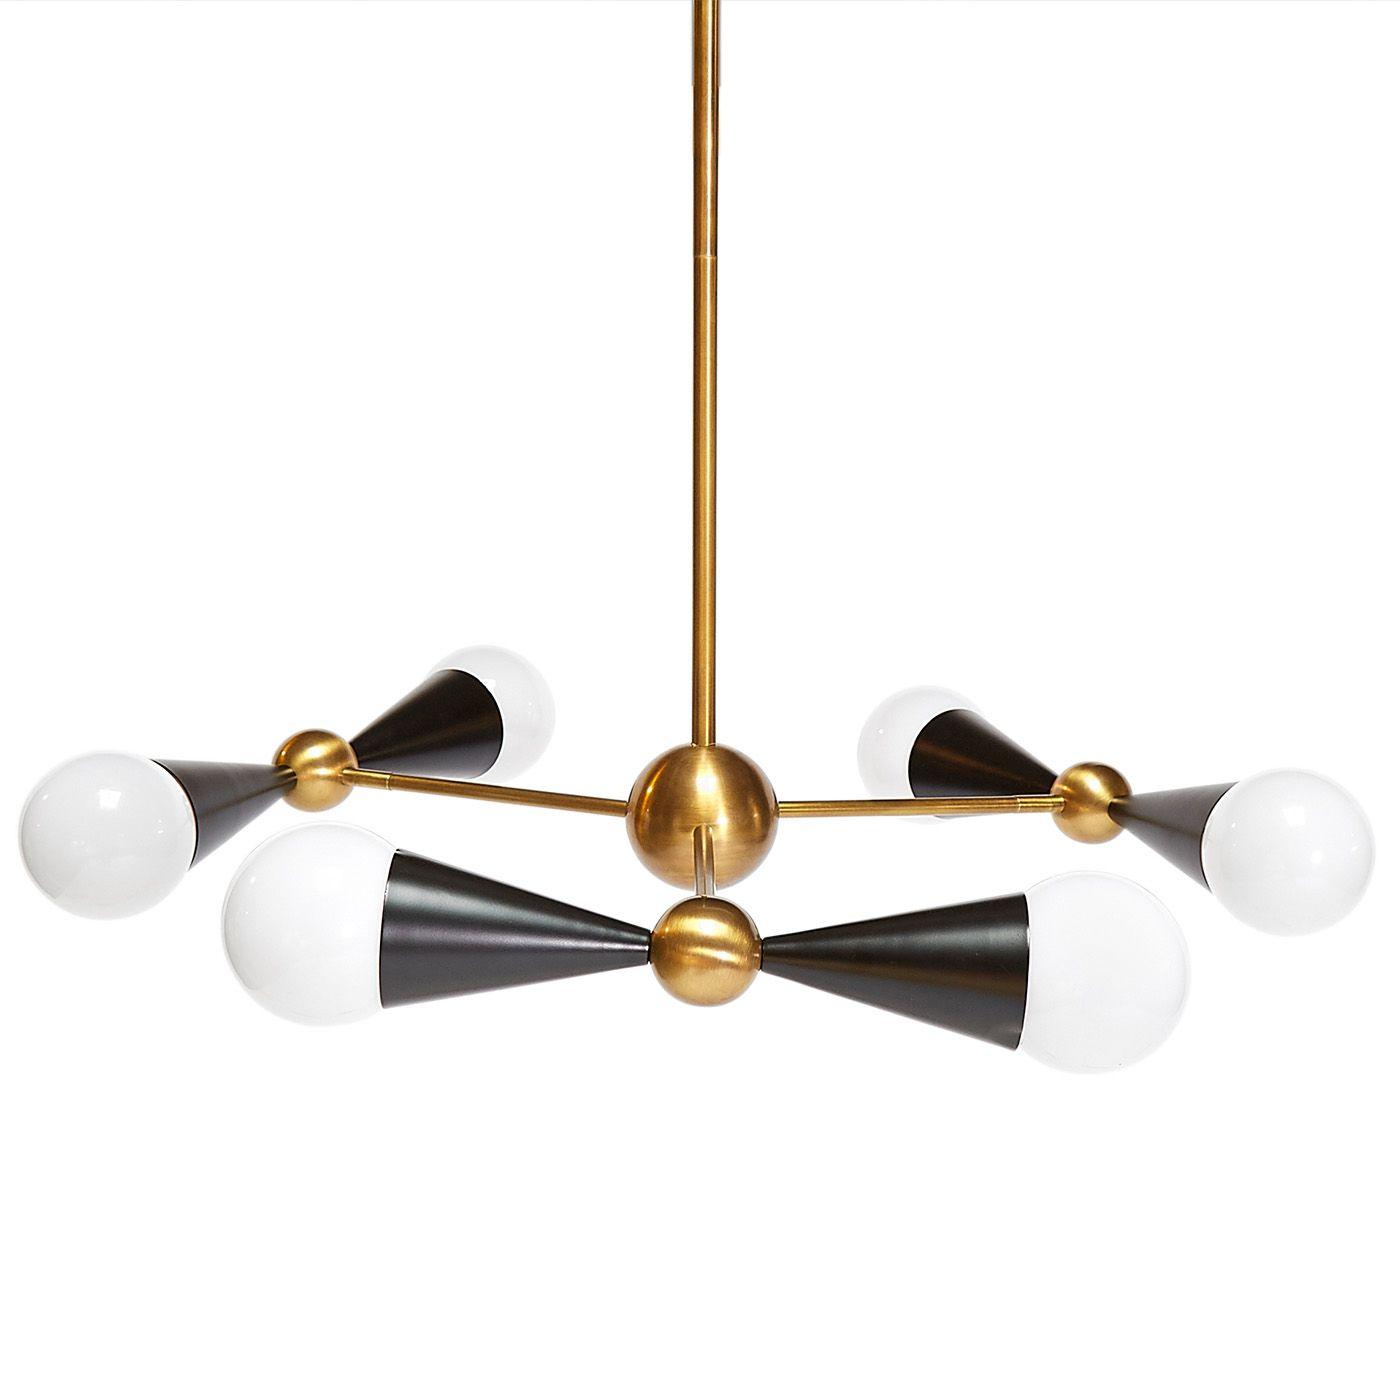 Jonathan adler caracas six light chandelier caracas chandeliers jonathan adler caracas six light chandelier arubaitofo Choice Image